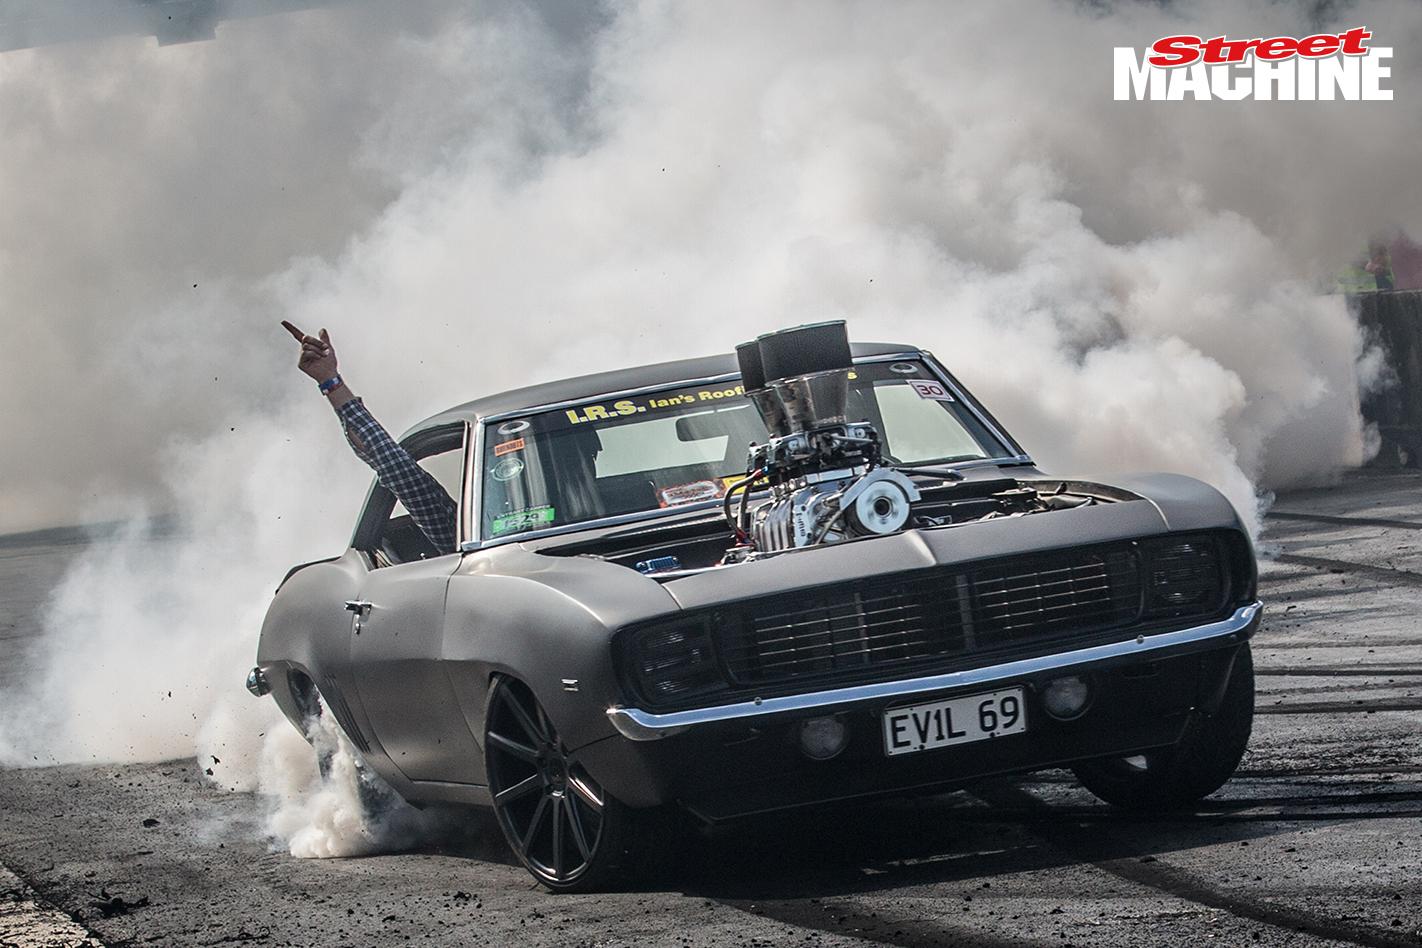 Chey Camaro Blown Burnout EVIL69